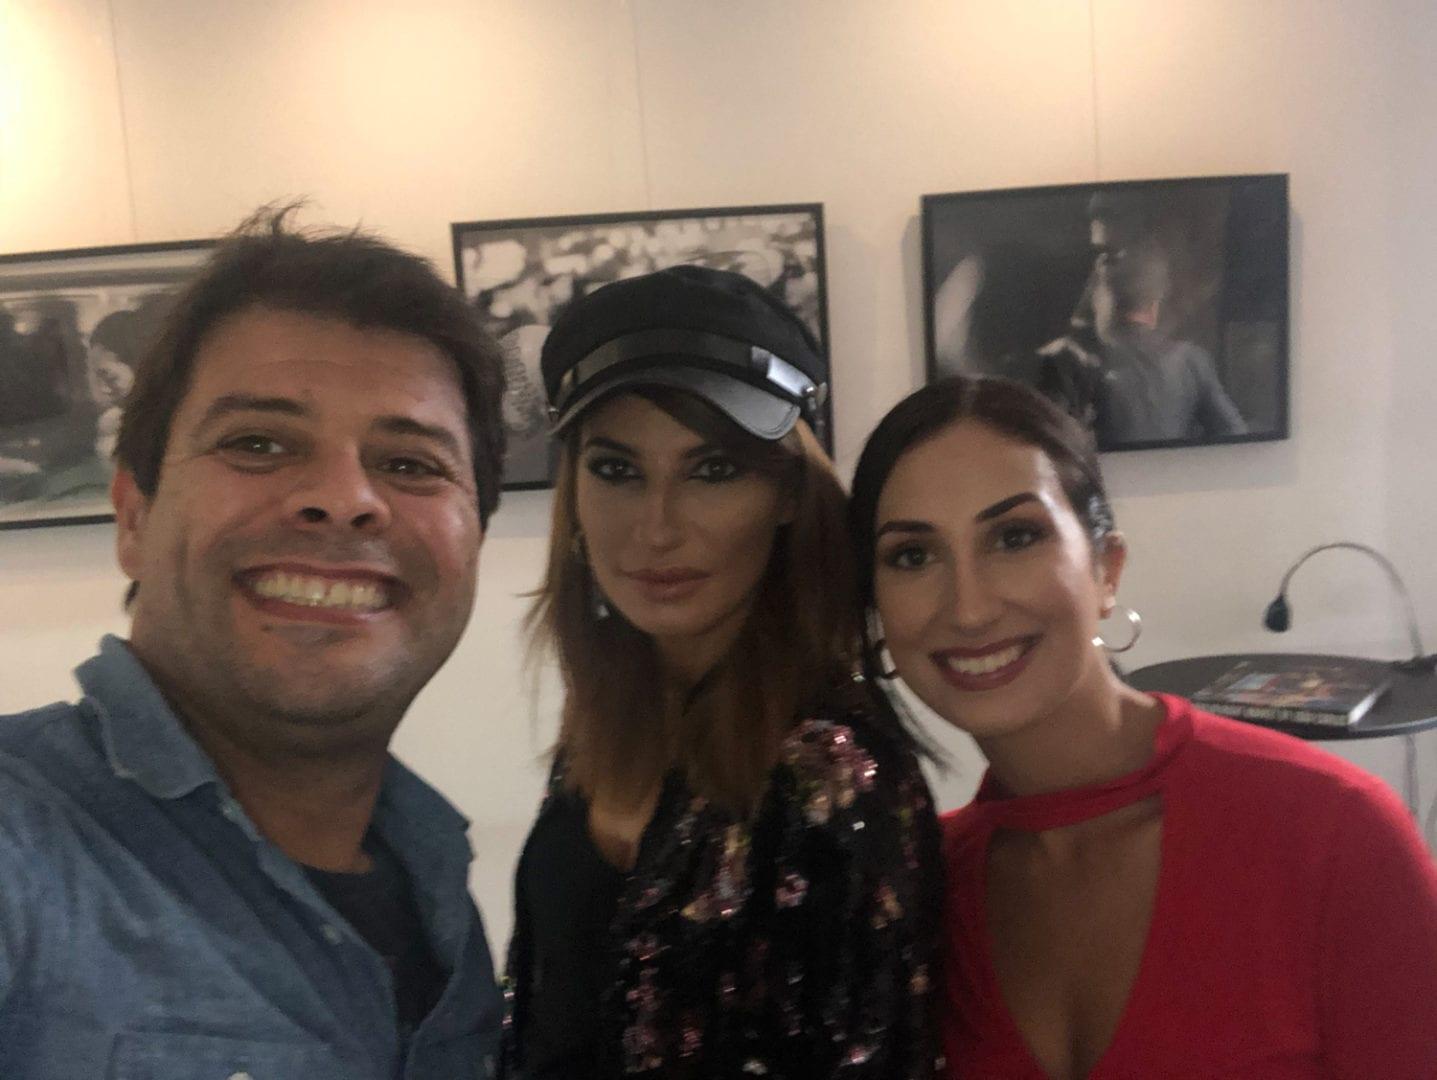 The crew! Me, Raquel Prates and Diana Saavedra